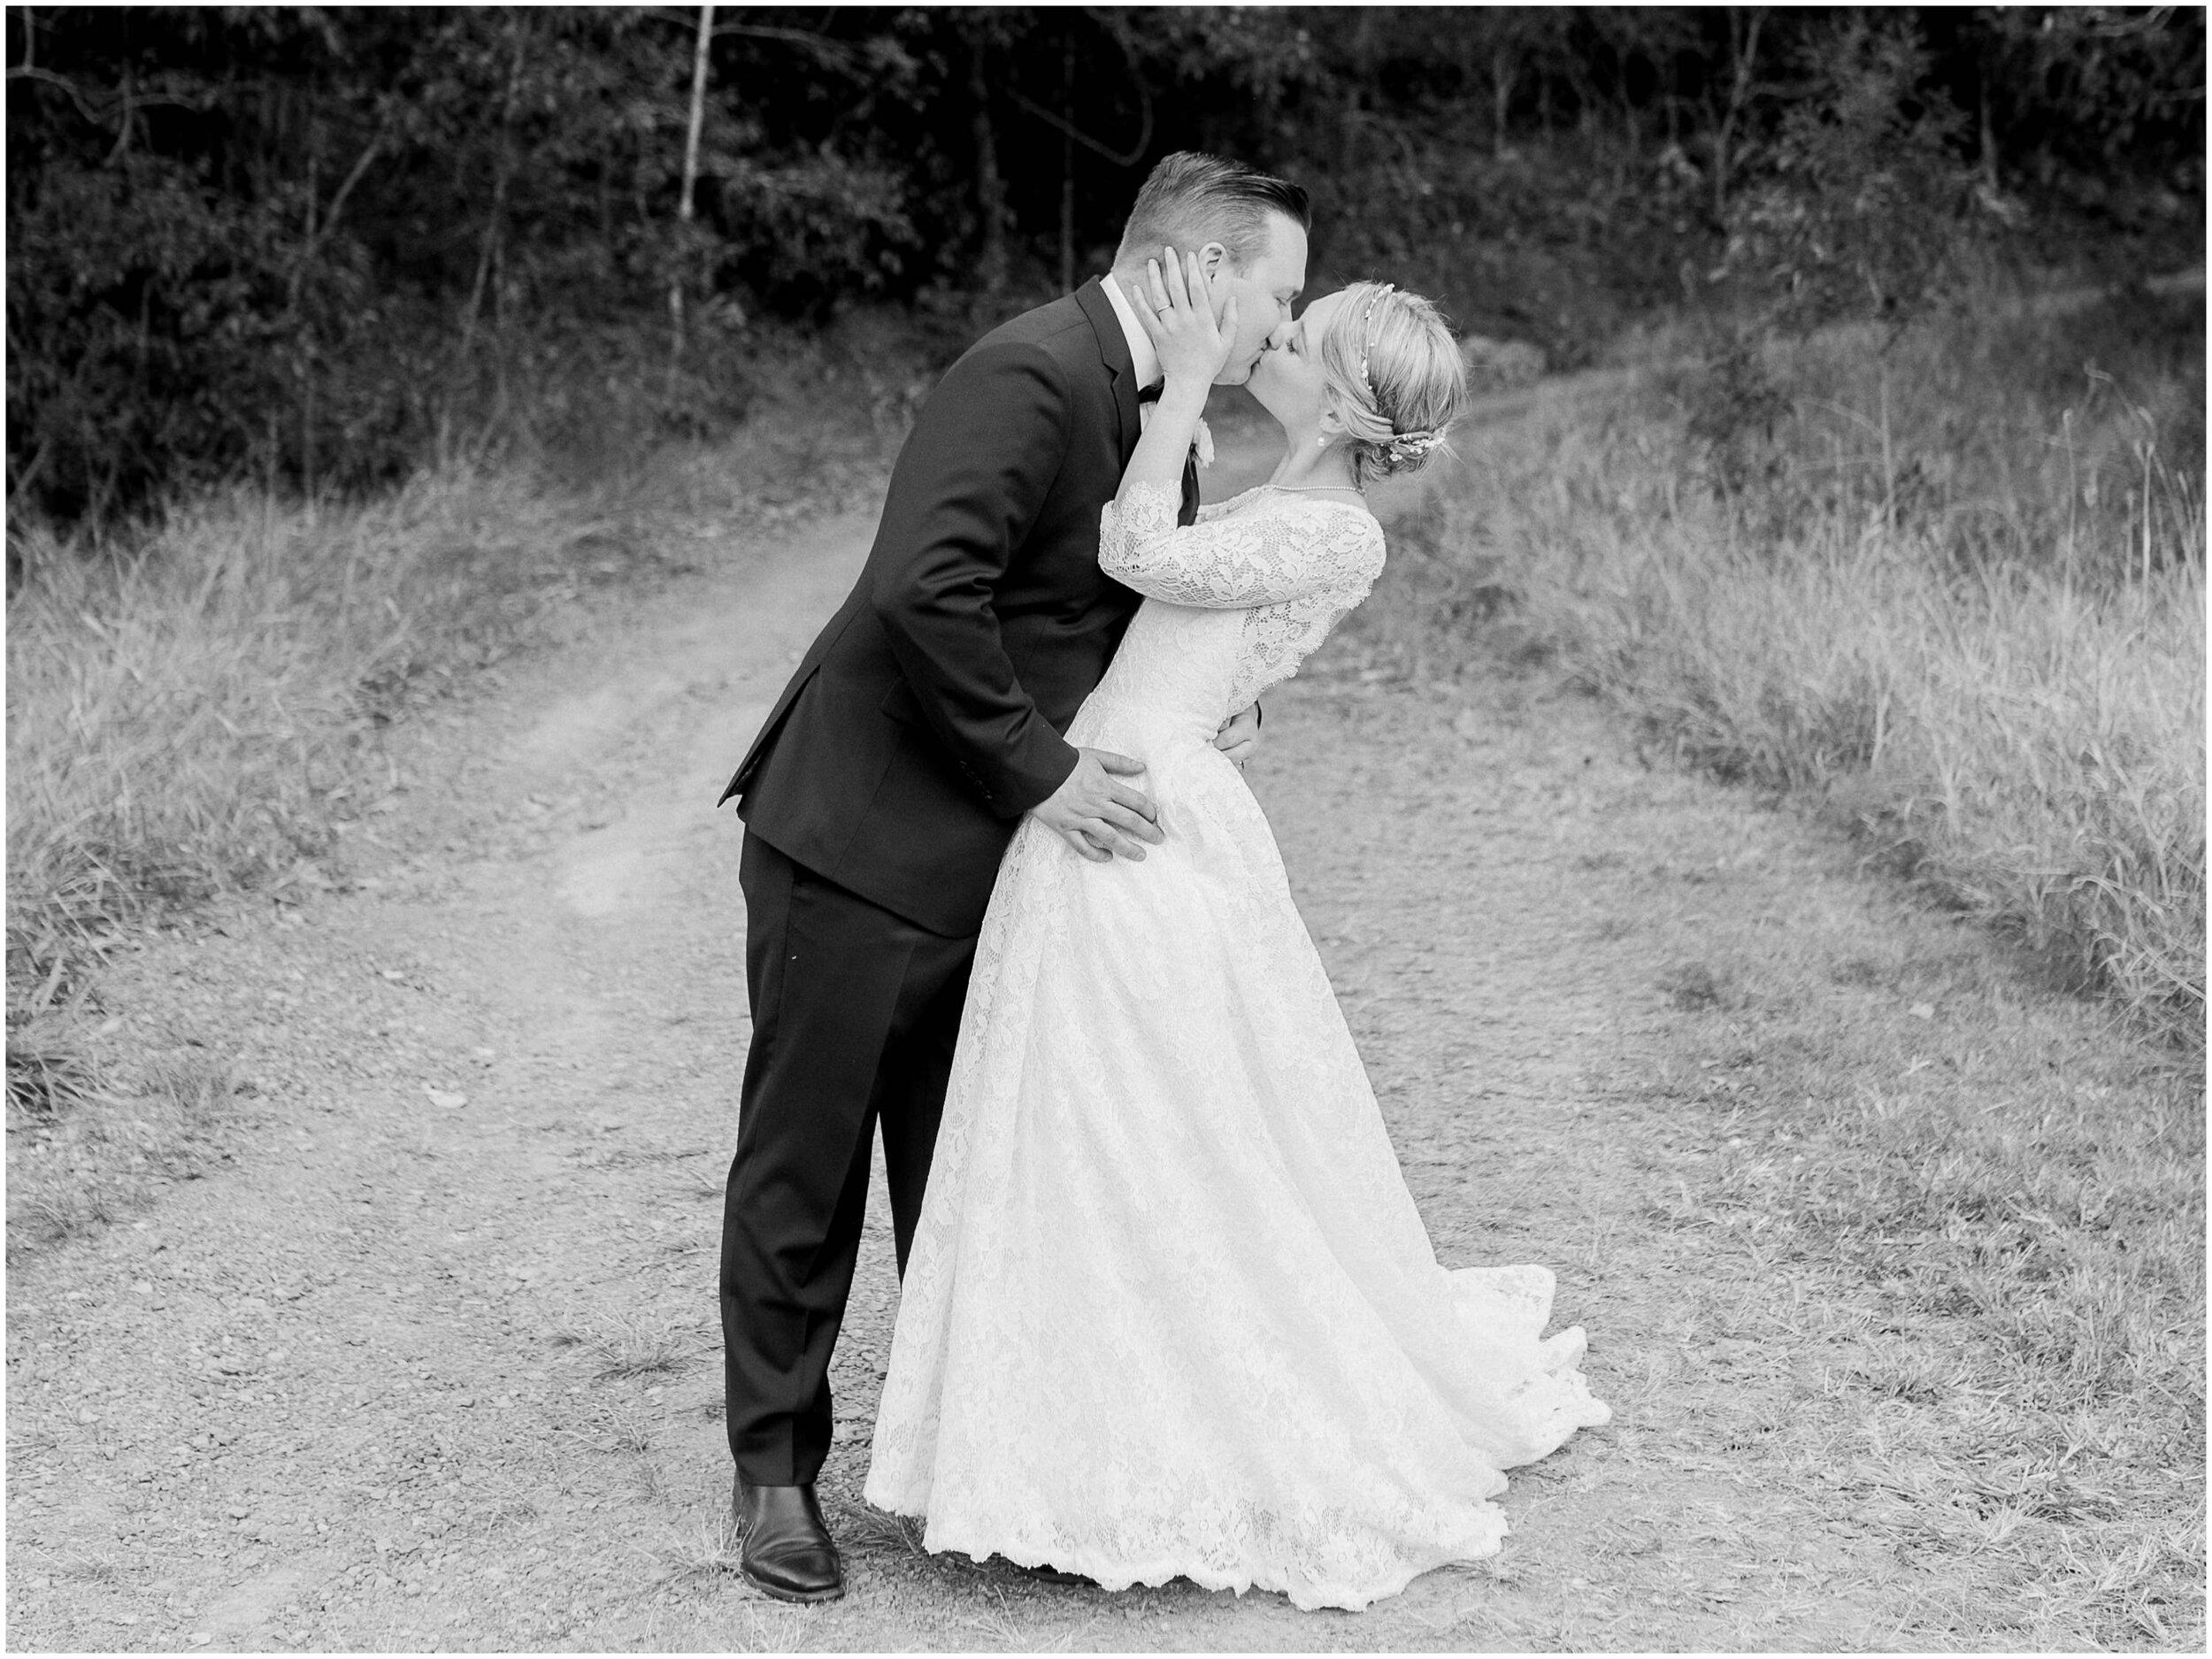 brisbane-film-wedding-photographer-lauren-olivia-luxury-wedding-australia-01-18.jpg